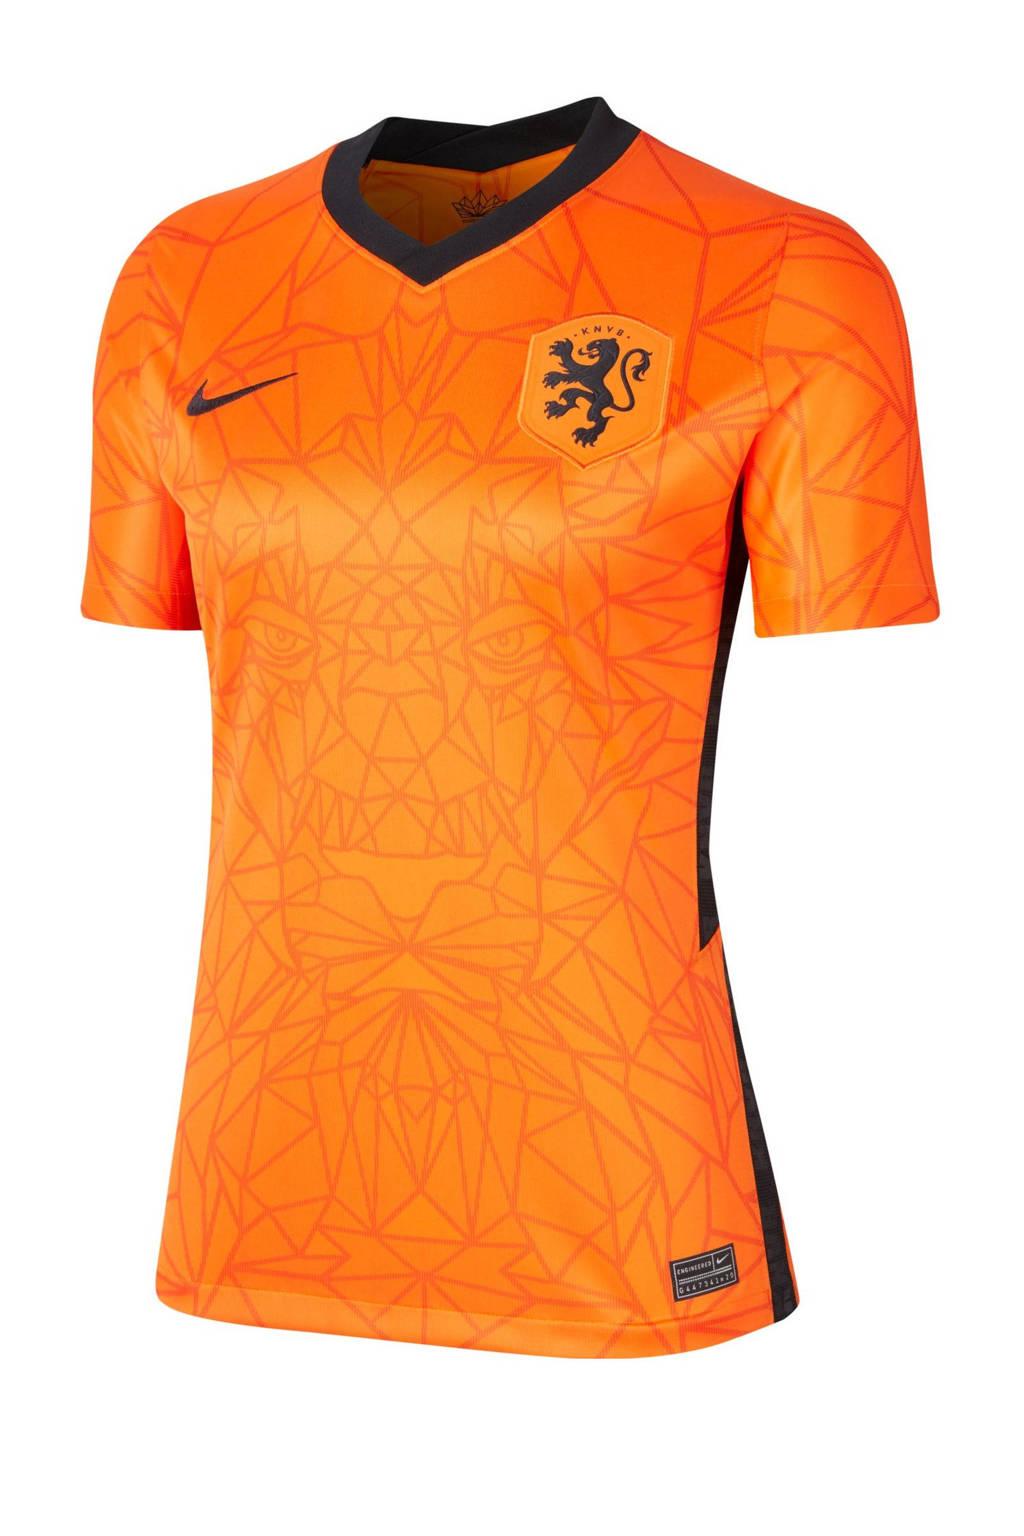 Nike Nederland voetbalshirt oranje/zwart, Oranje/zwart